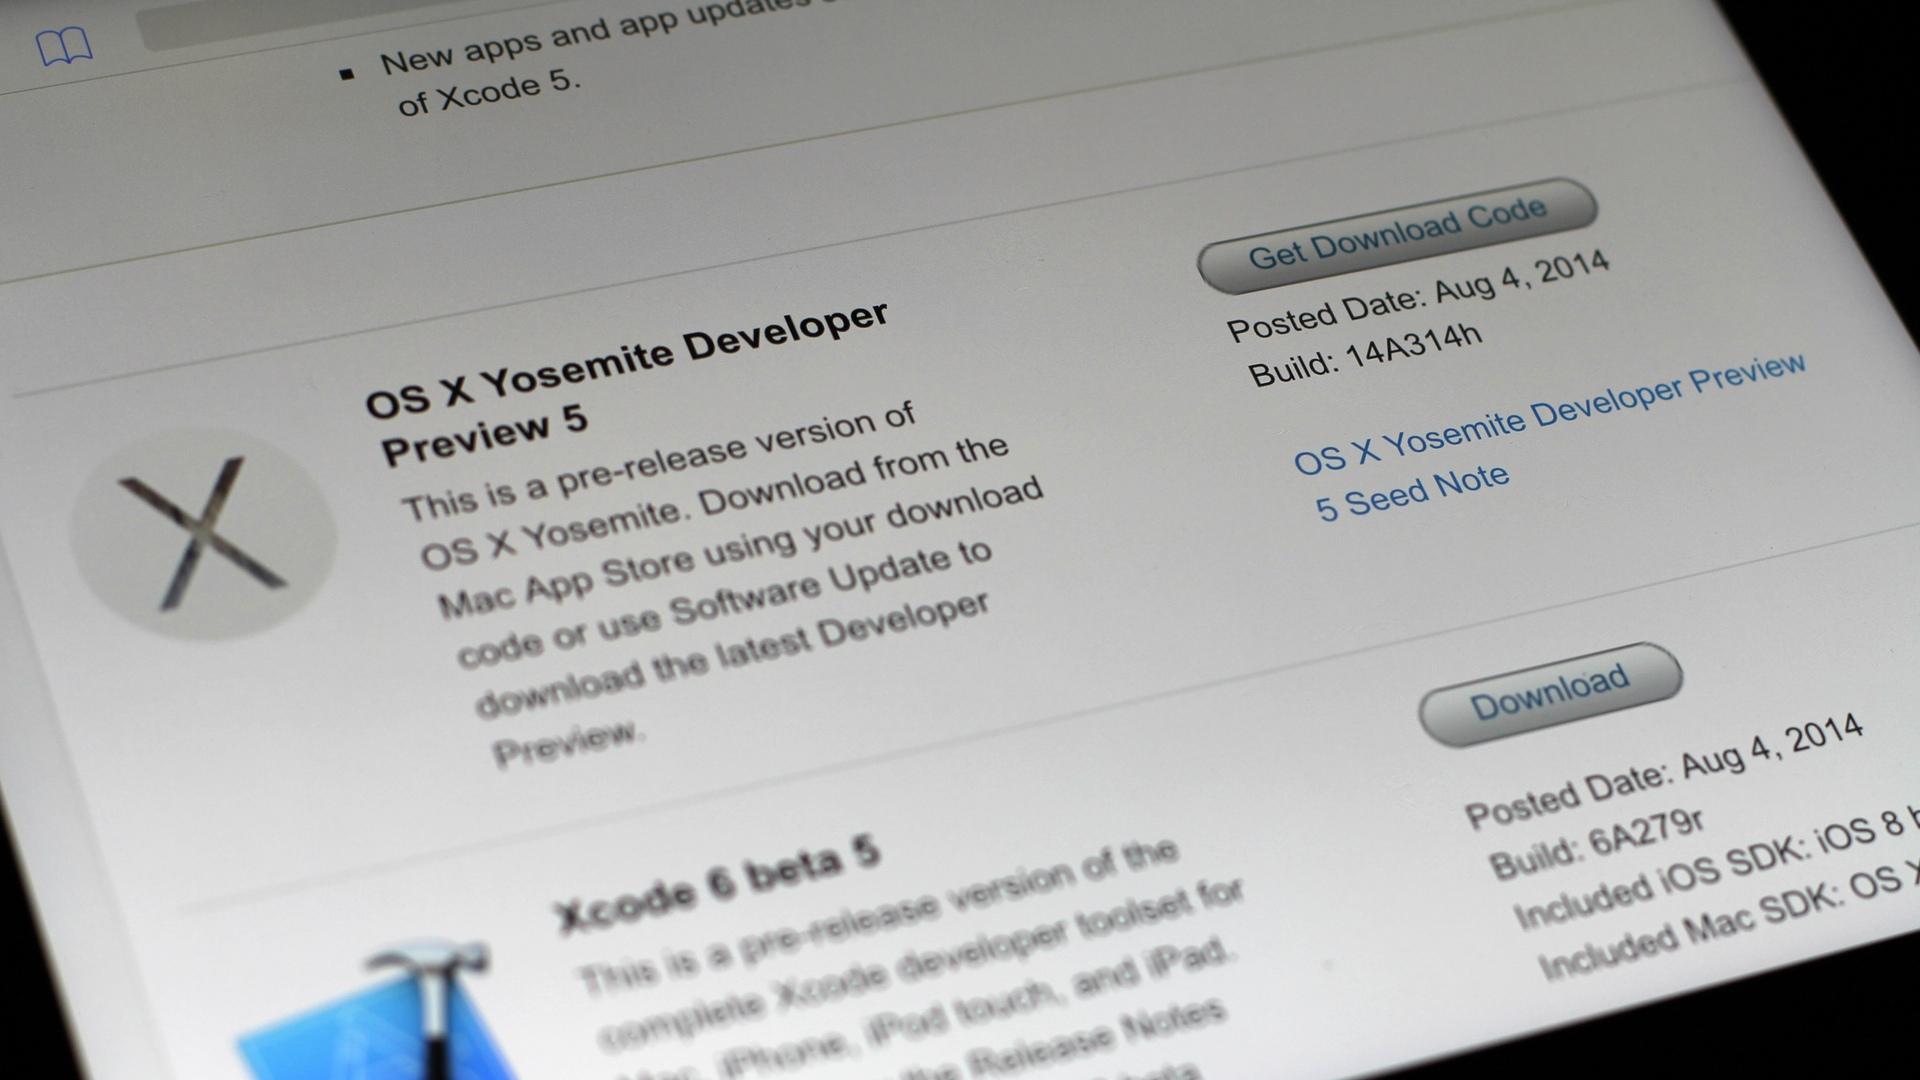 OS X Yosemite Developer Preview 5 build 14A314h